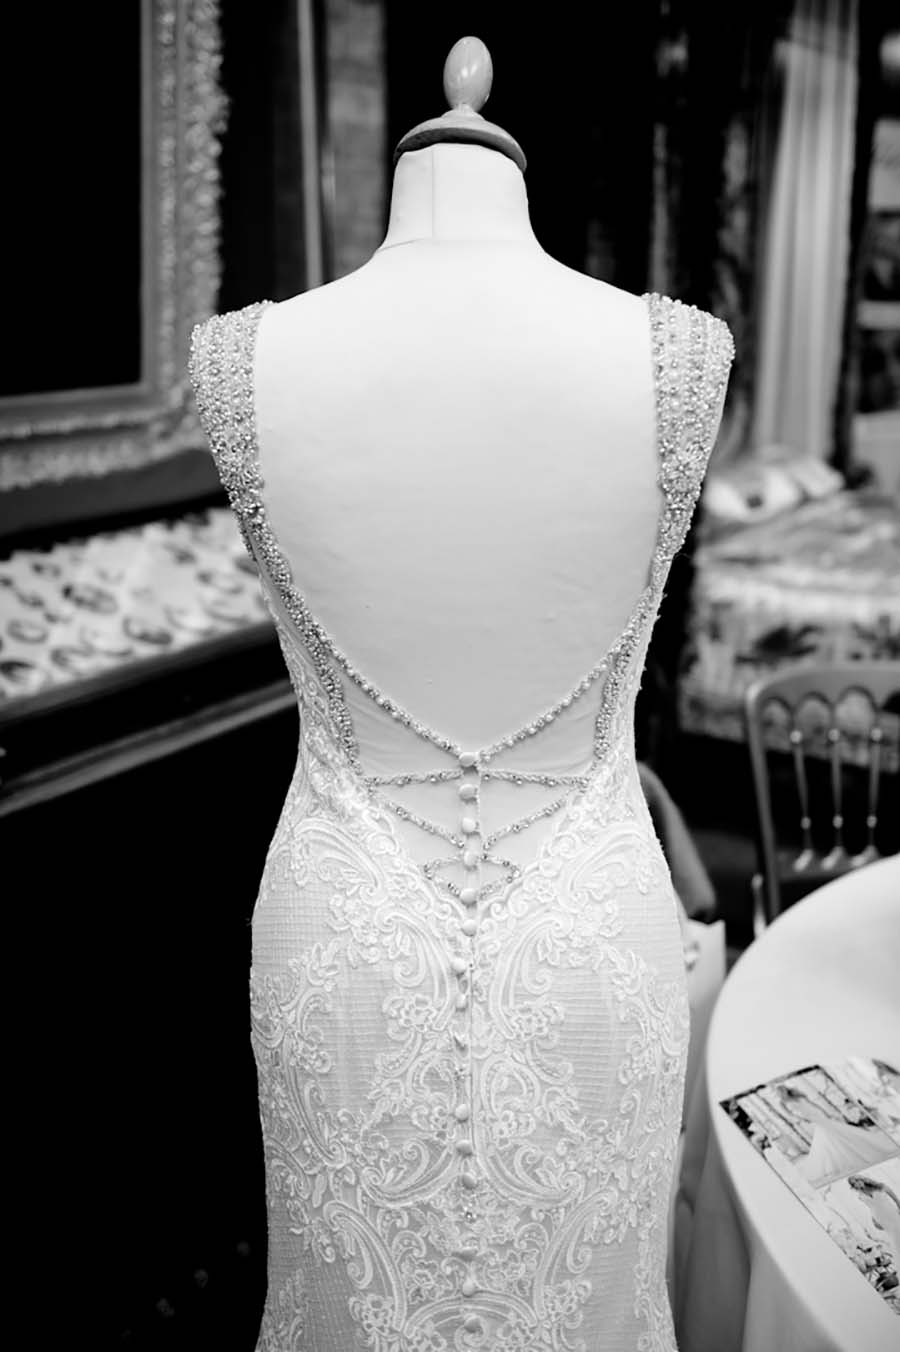 Buckinghams-at-belvoir-castle-wedding-fair-rachael-connerton-photography-31